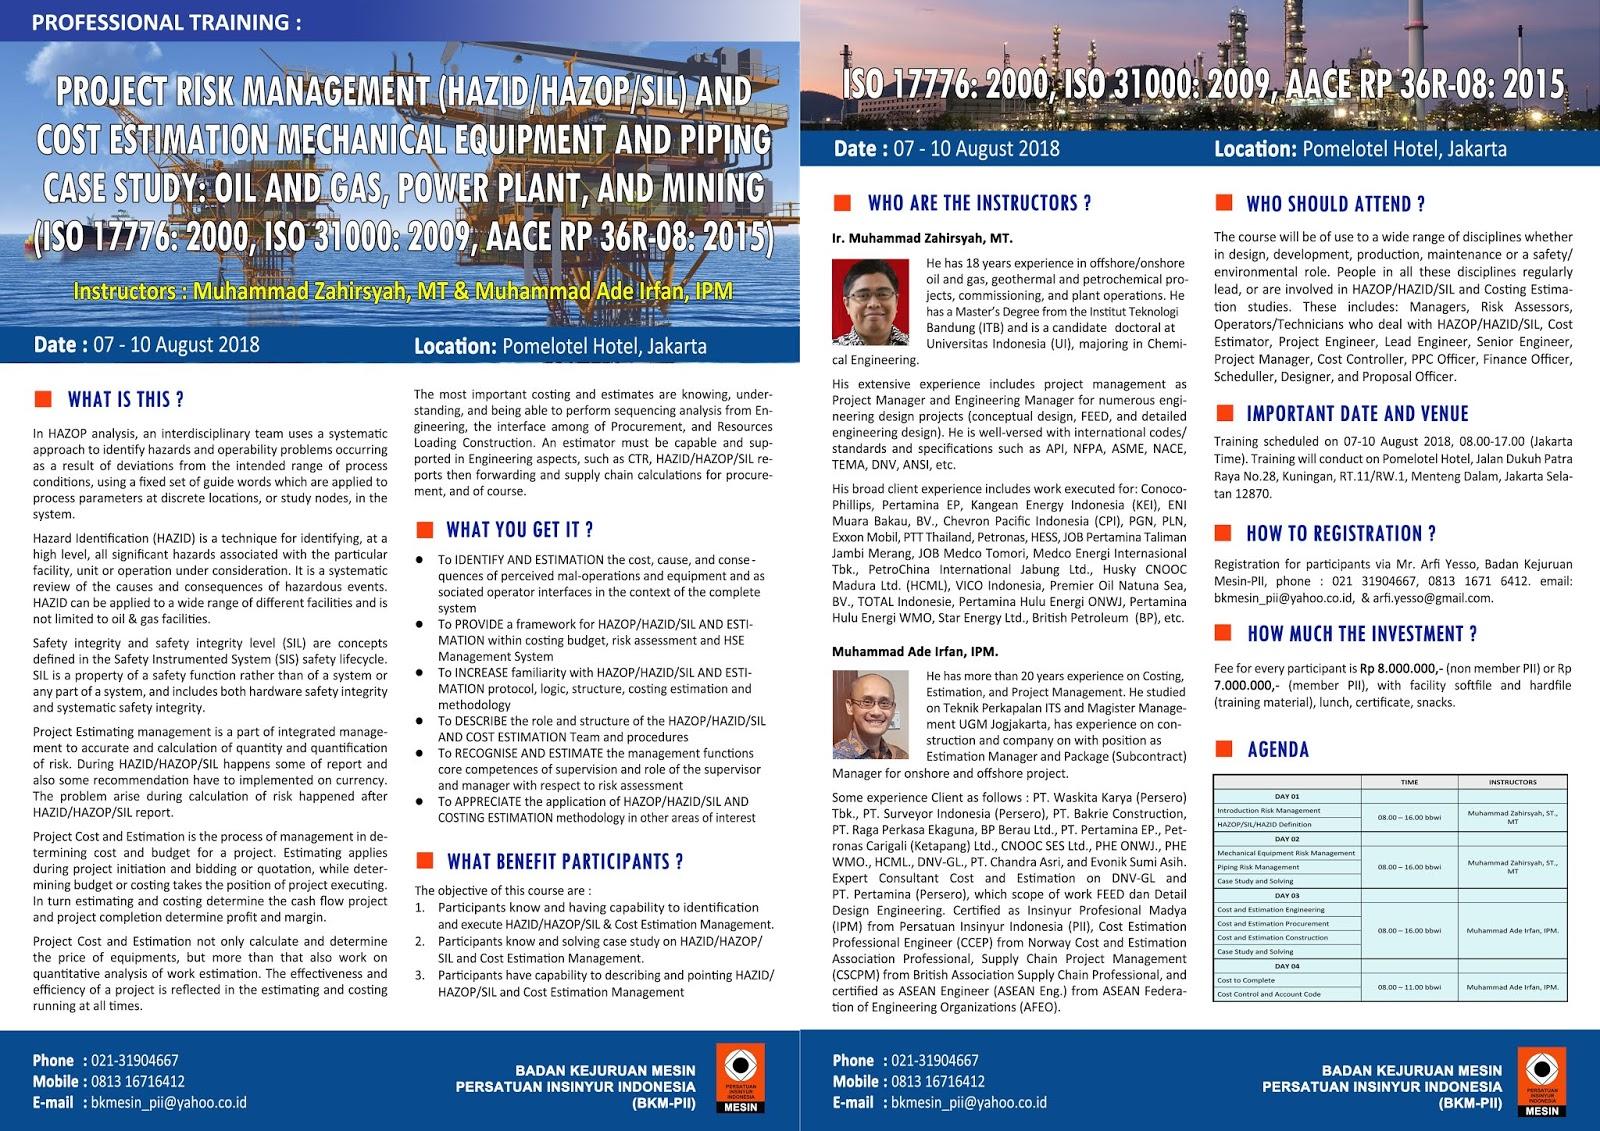 PROFESSIONAL TRAINING : PROJECT RISK MANAGEMENT (HAZID/HAZOP